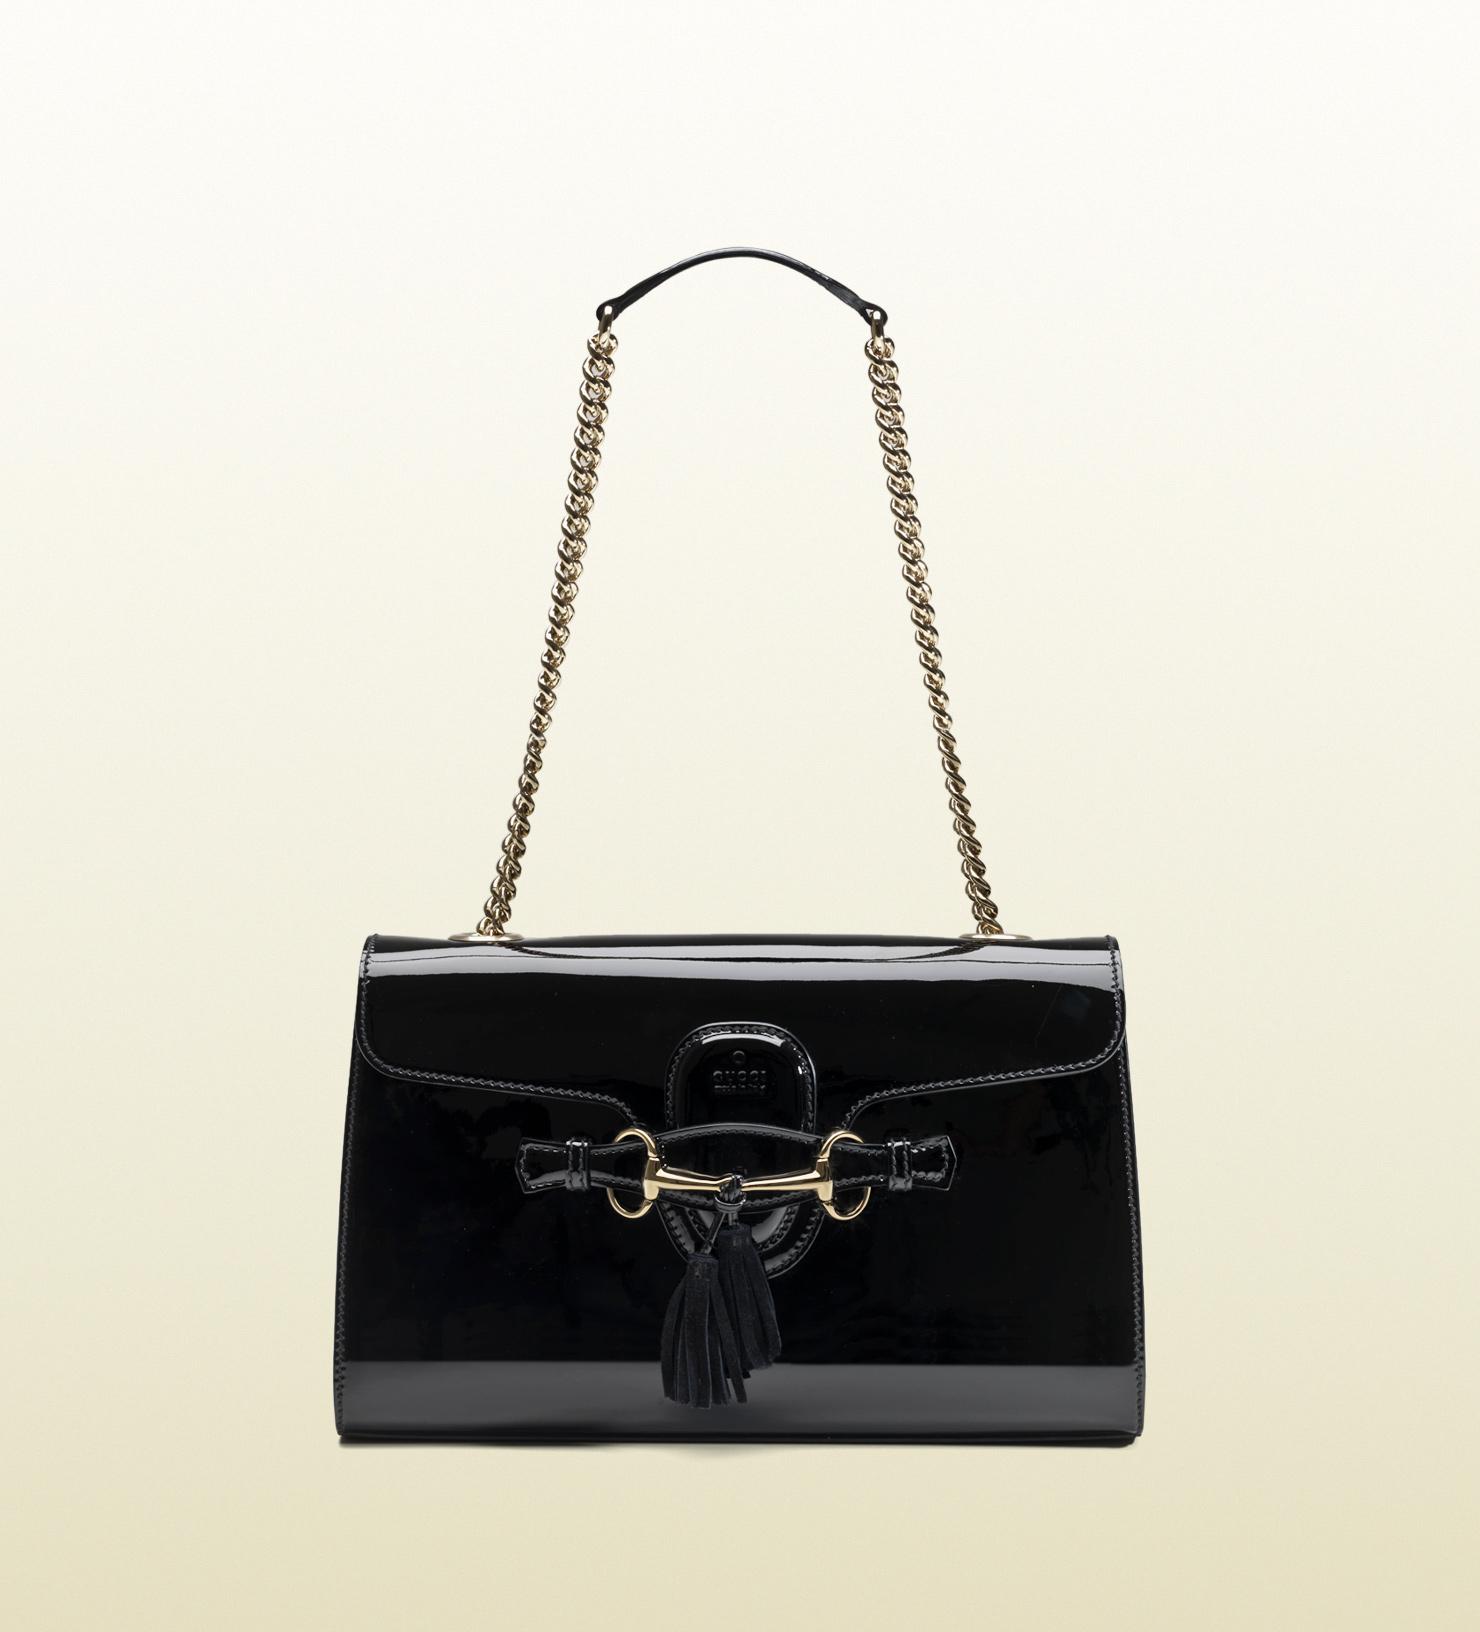 0cb088ae58c4 Gucci Black Patent Leather Purse - Best Purse Image Ccdbb.Org